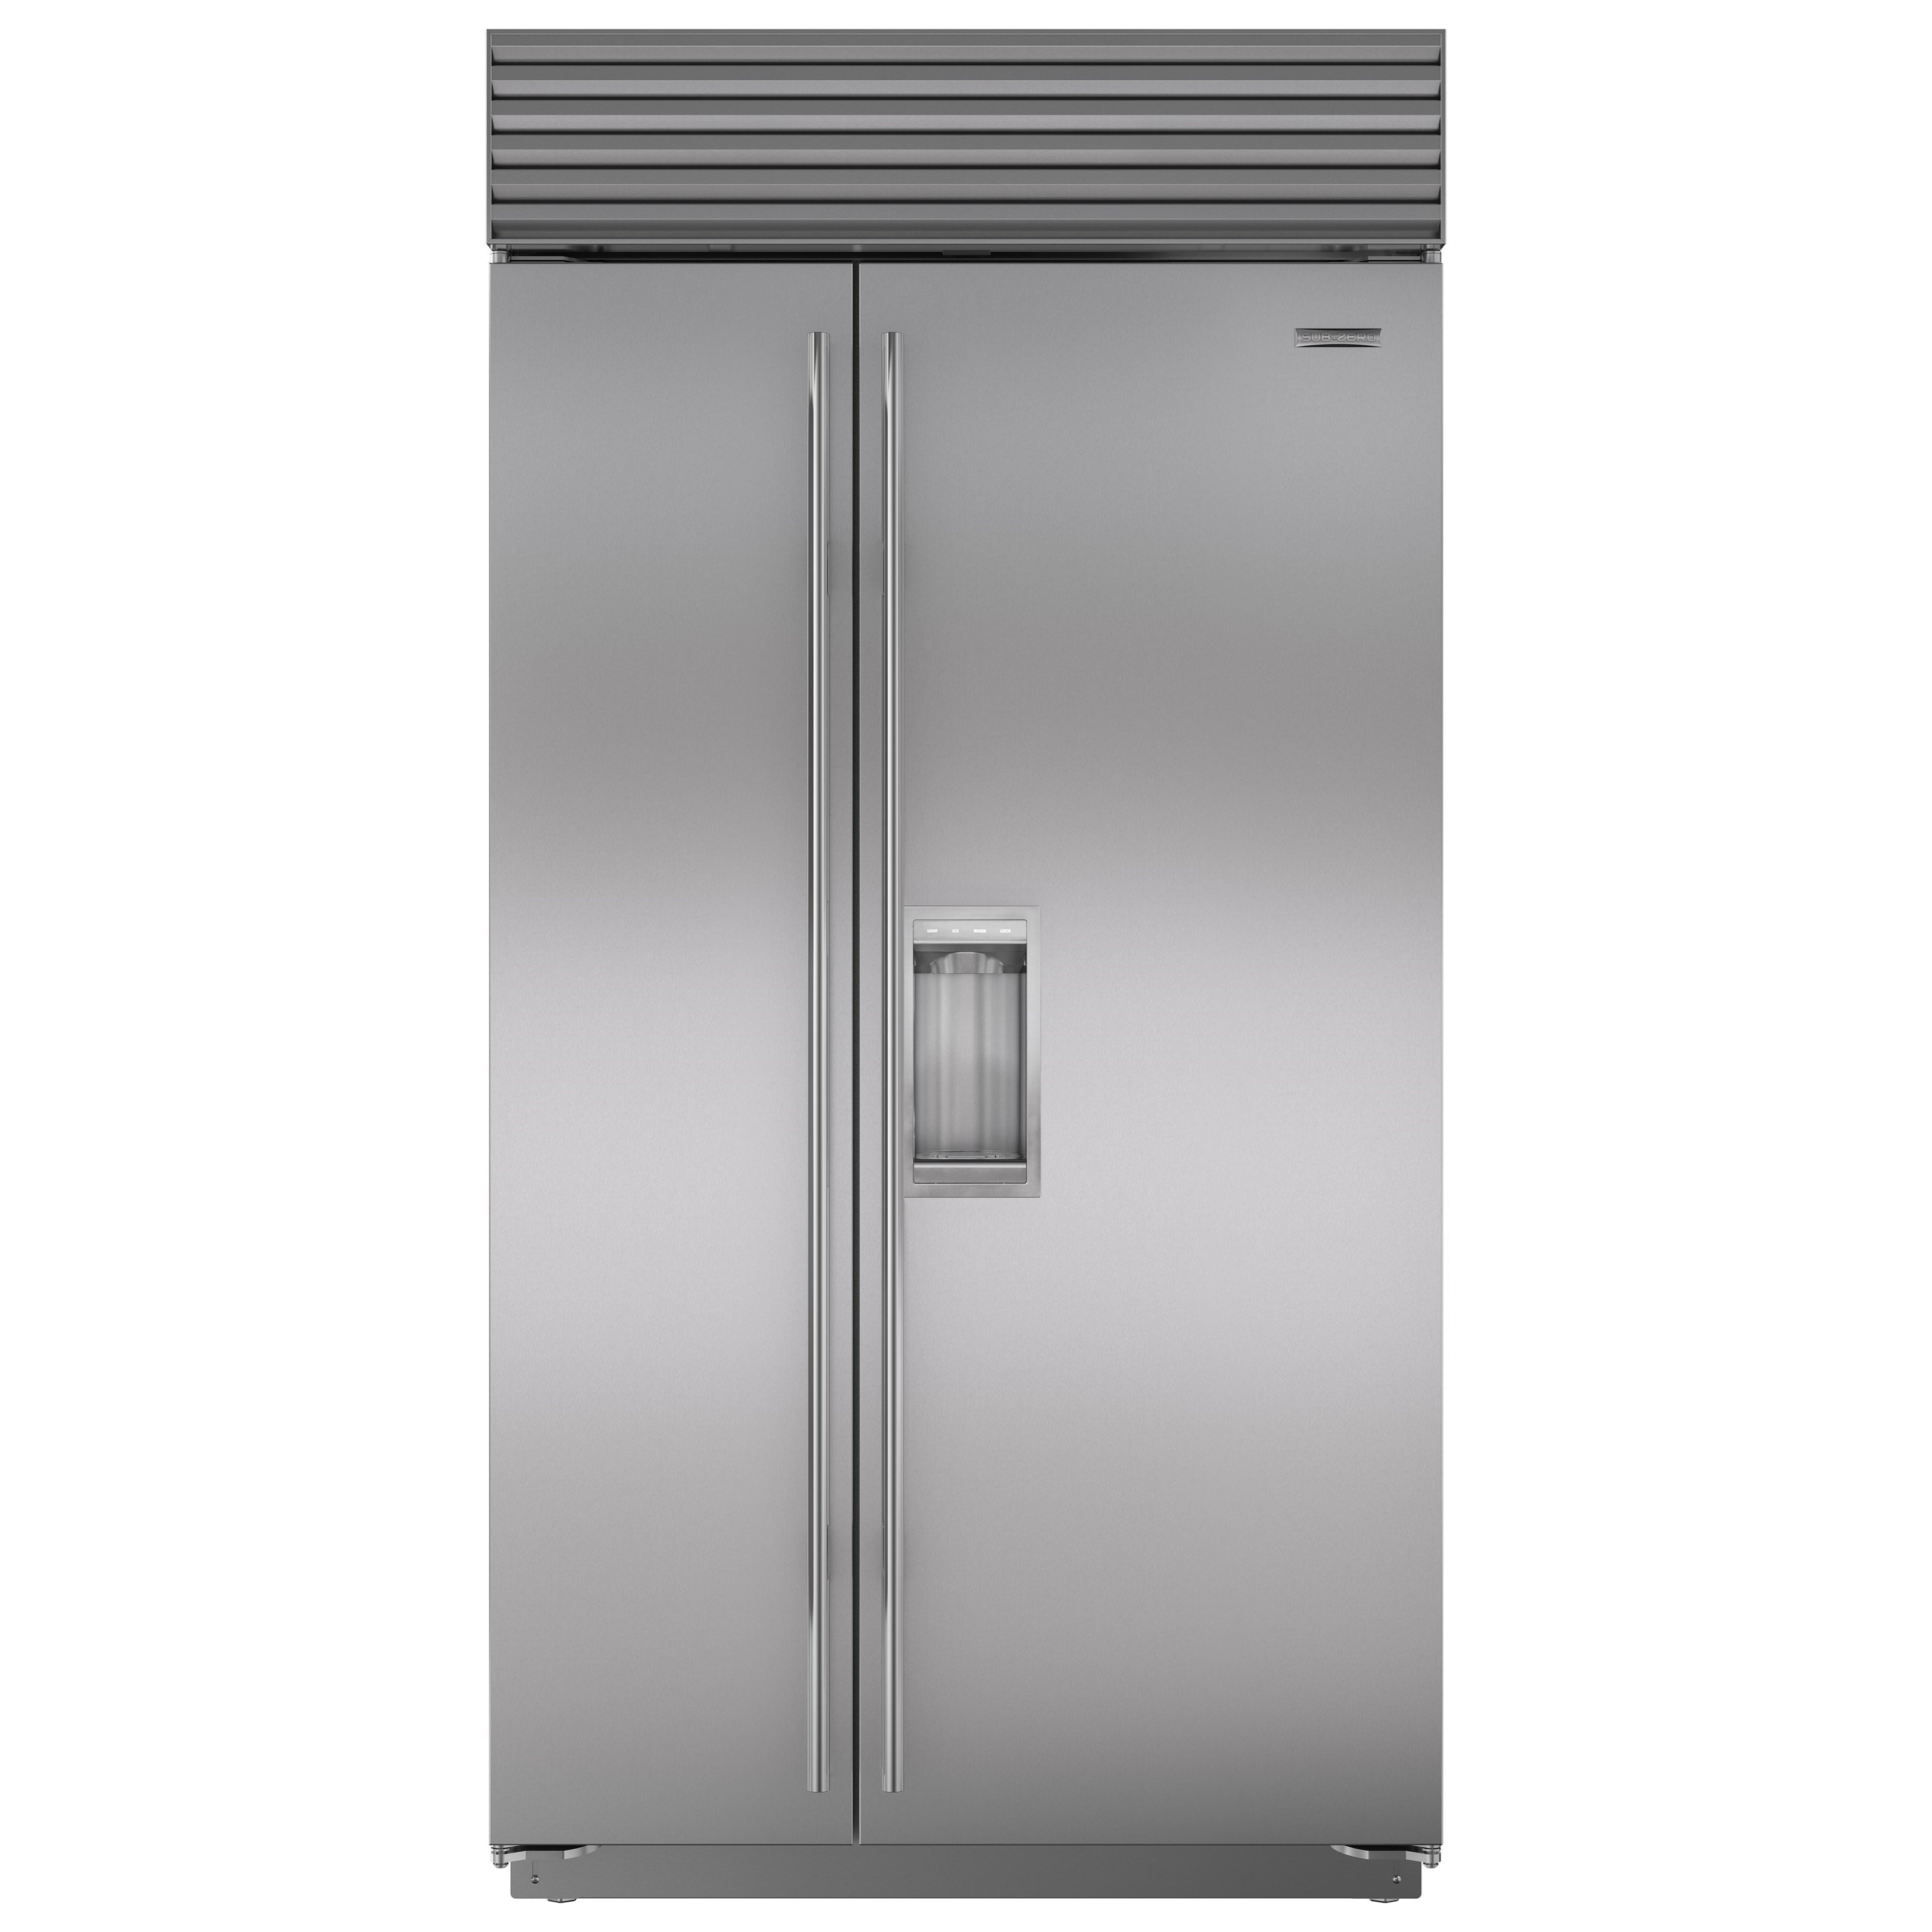 subzero double freezer sub refrigerator stock refrigerators integrated zero drawer models model in product showroom drawers